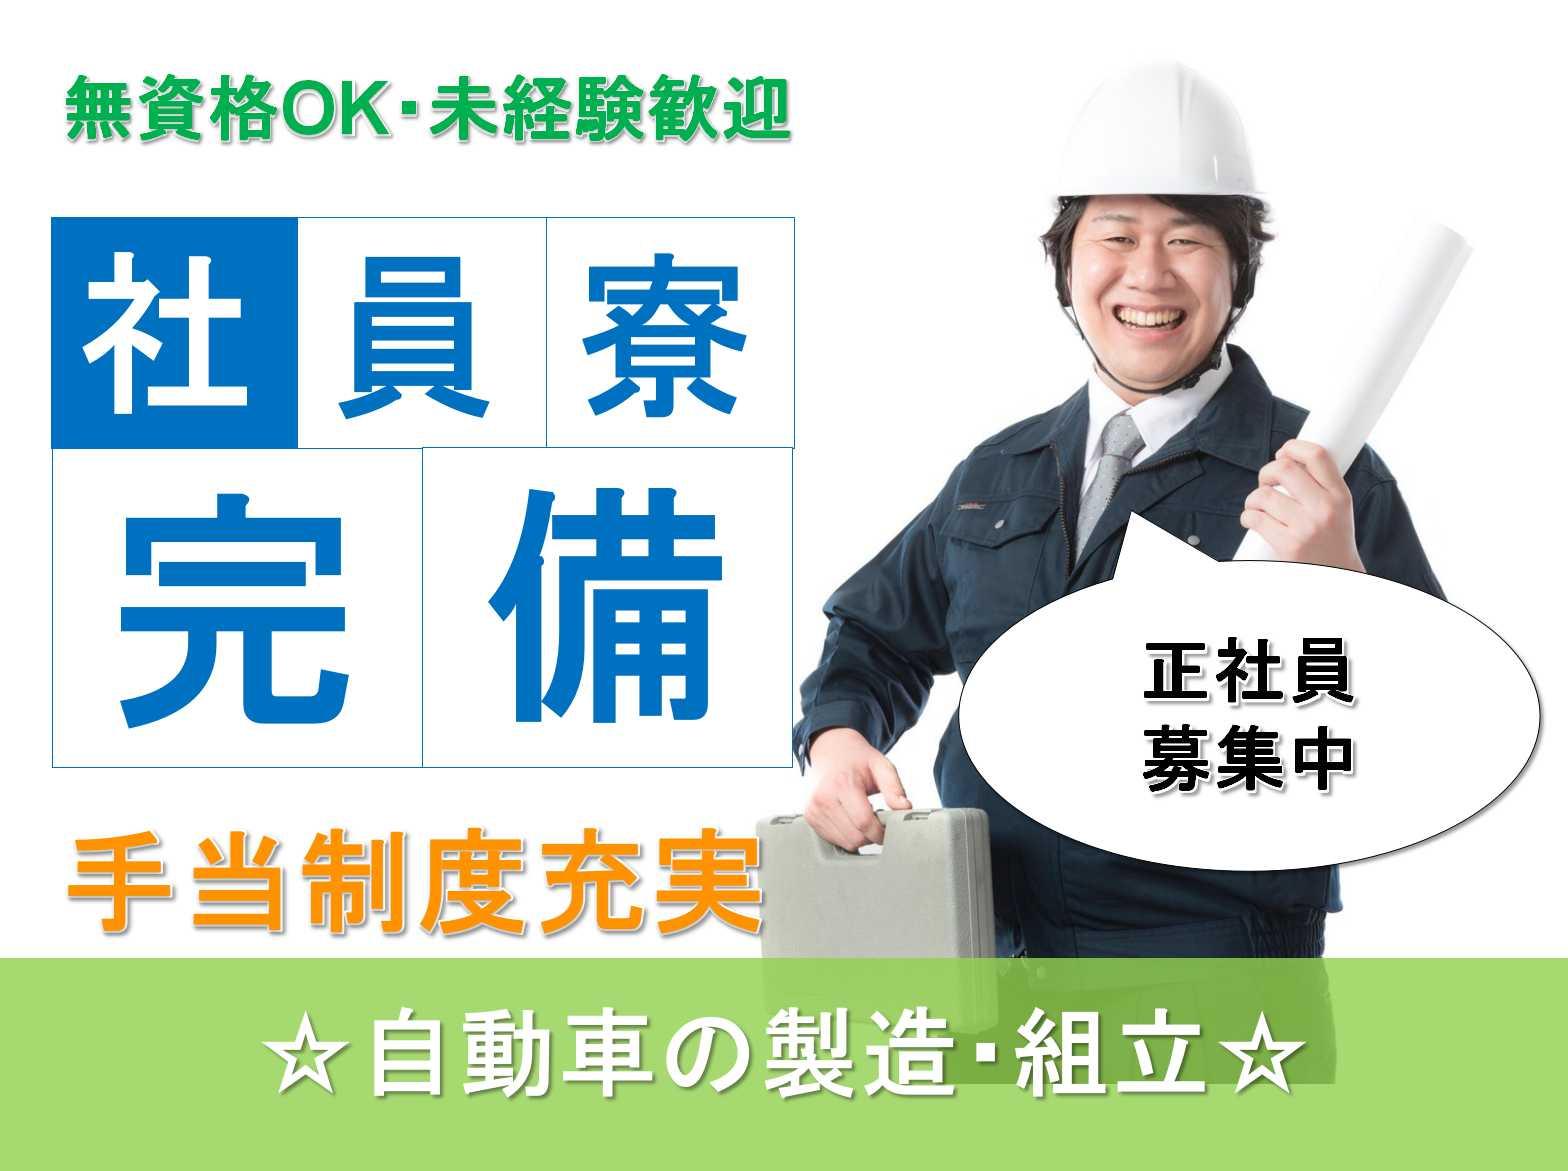 【正社員】無資格OK◆手当制度充実◆自動車の製造・組立◆ イメージ